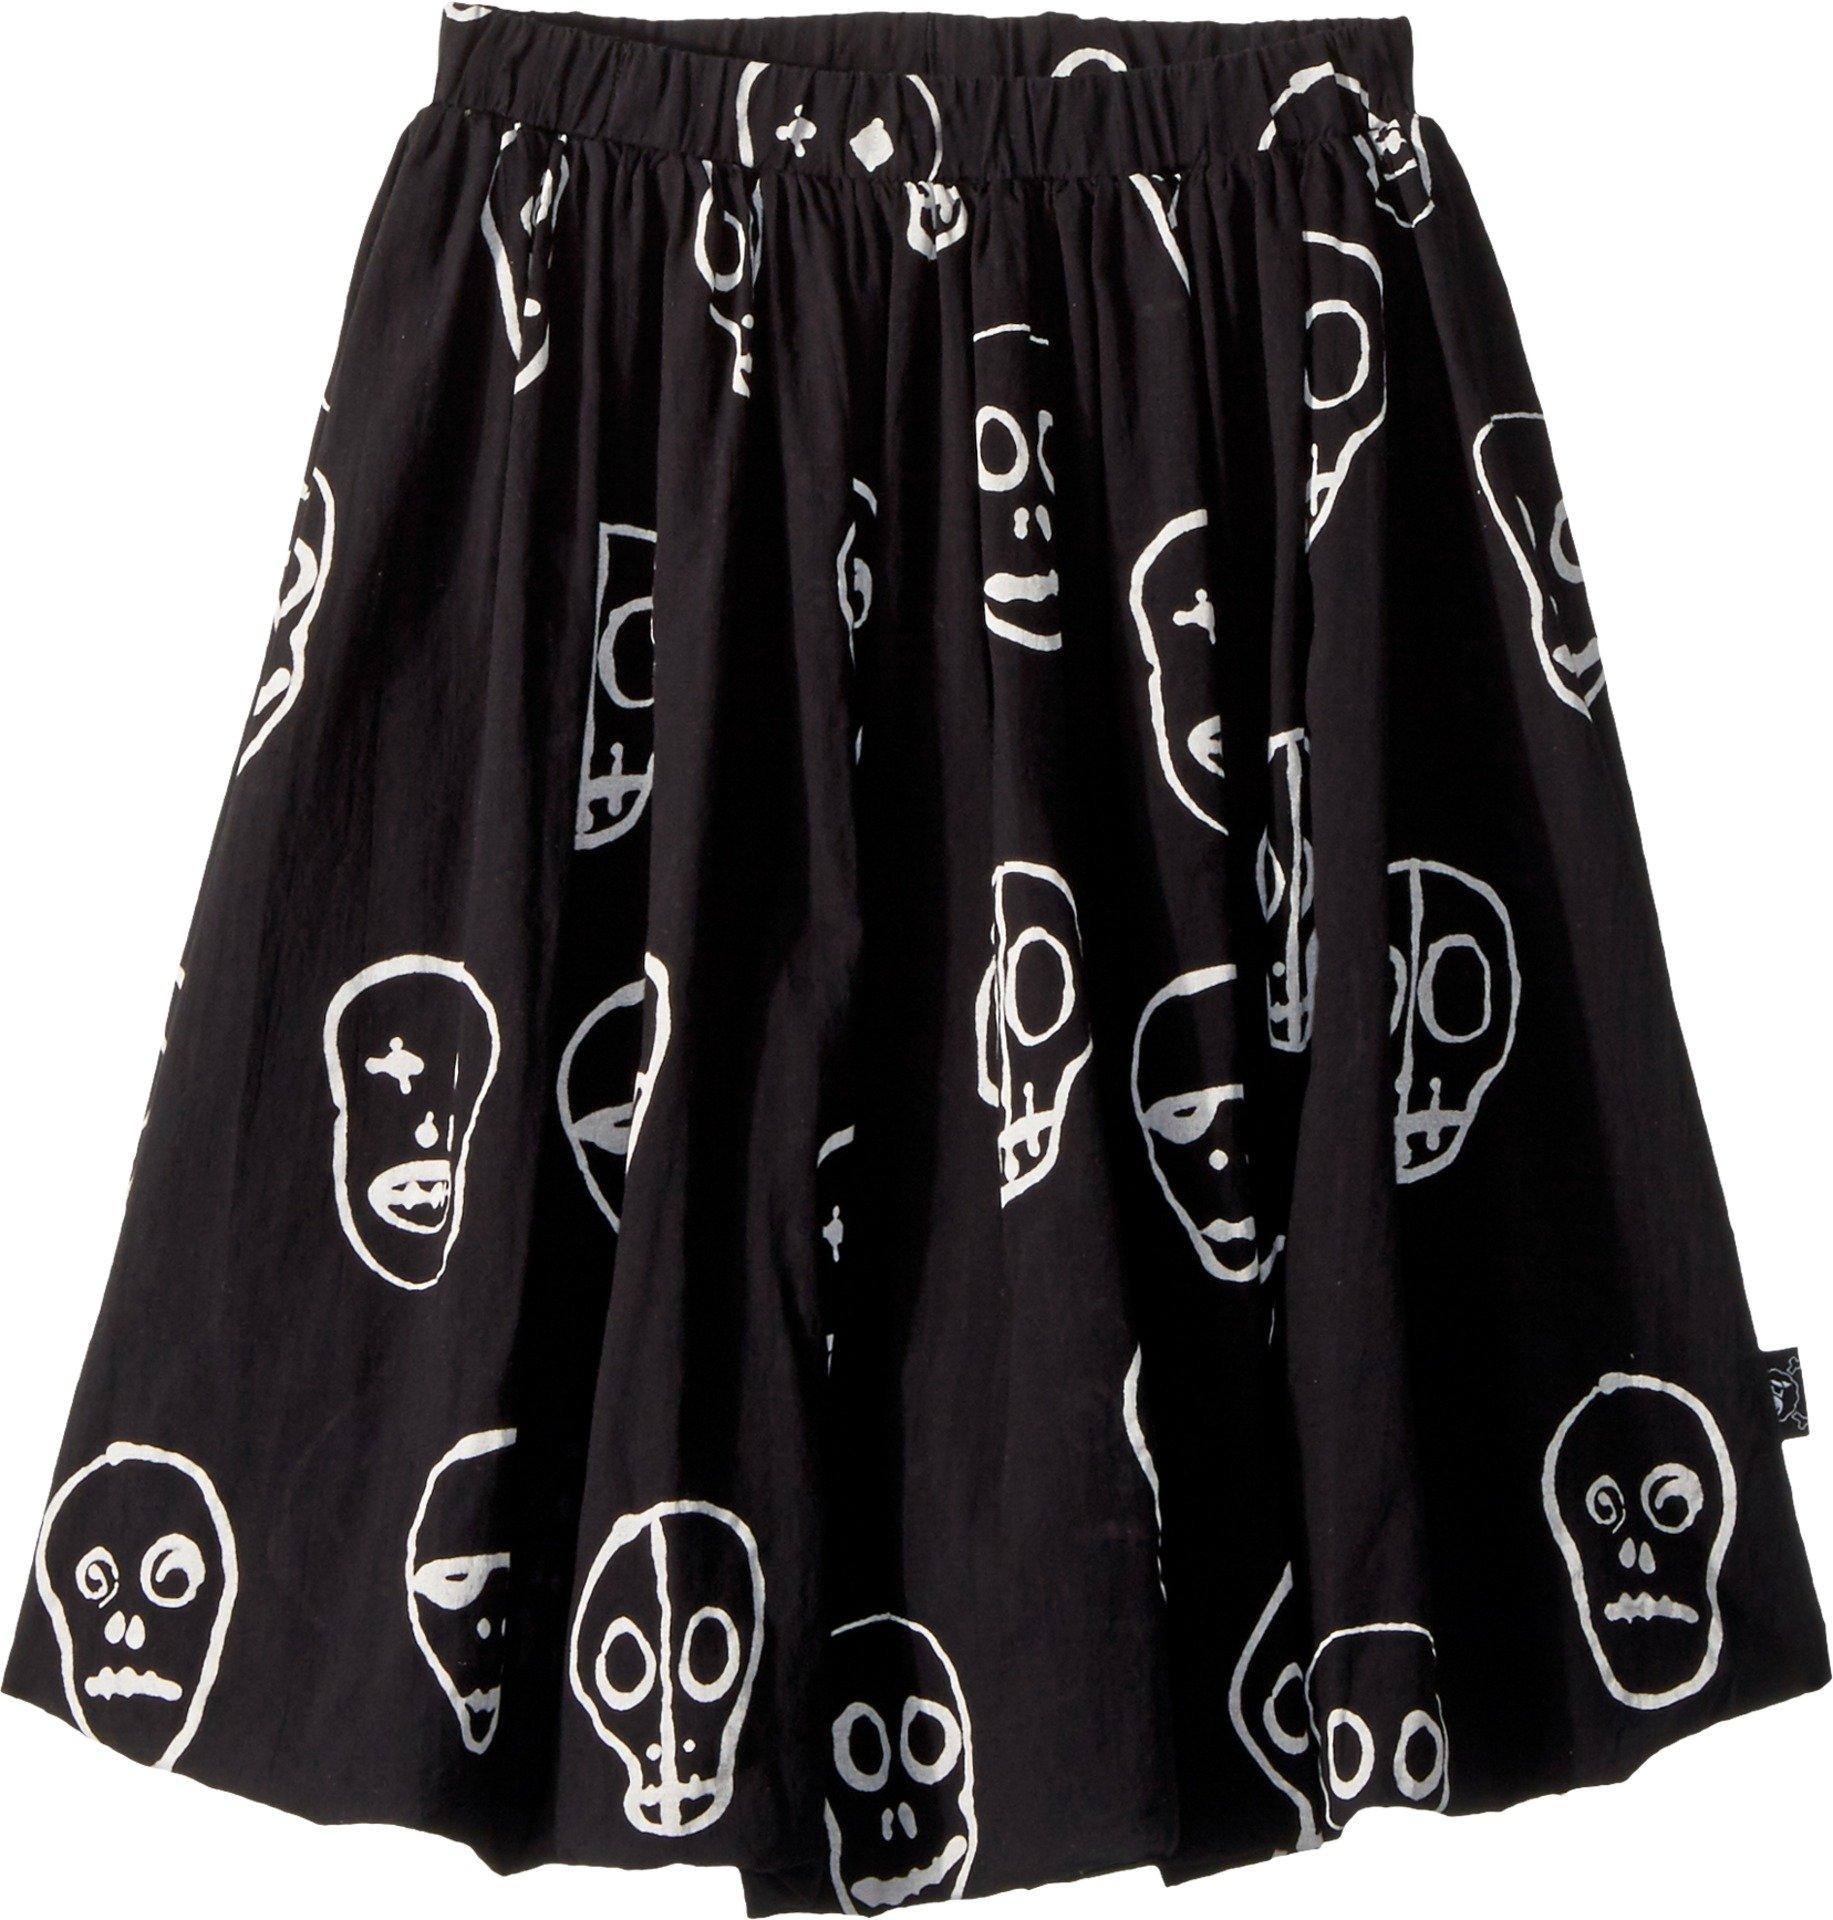 NUNUNU Girl's Skull Mask Balloon Skirt (Little Kids/Big Kids) Black 8-9 Years